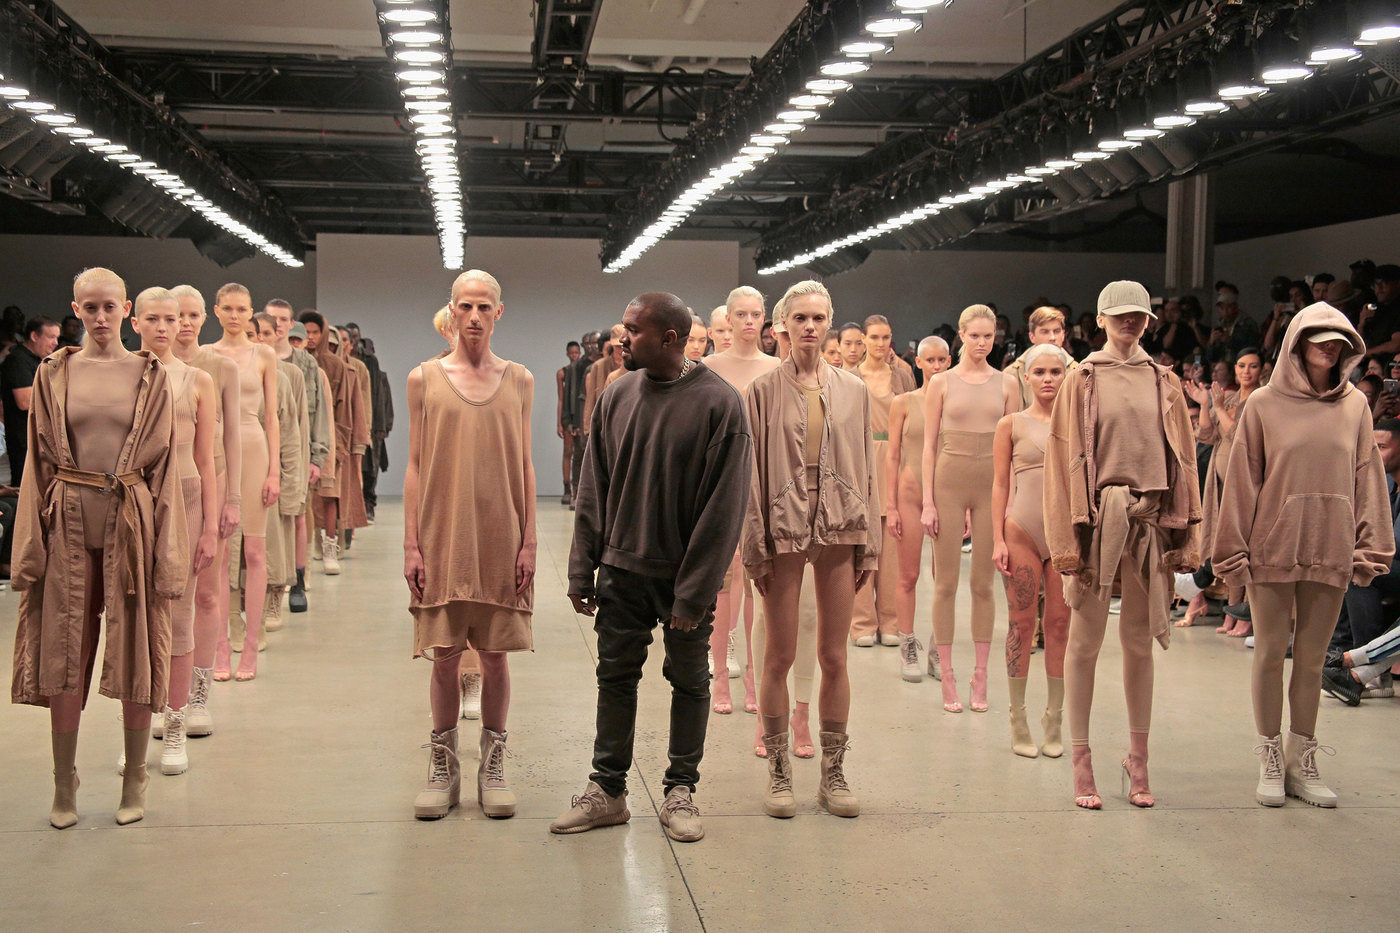 Kanye West finale of Yeezy Season 2 New York Fashion Week